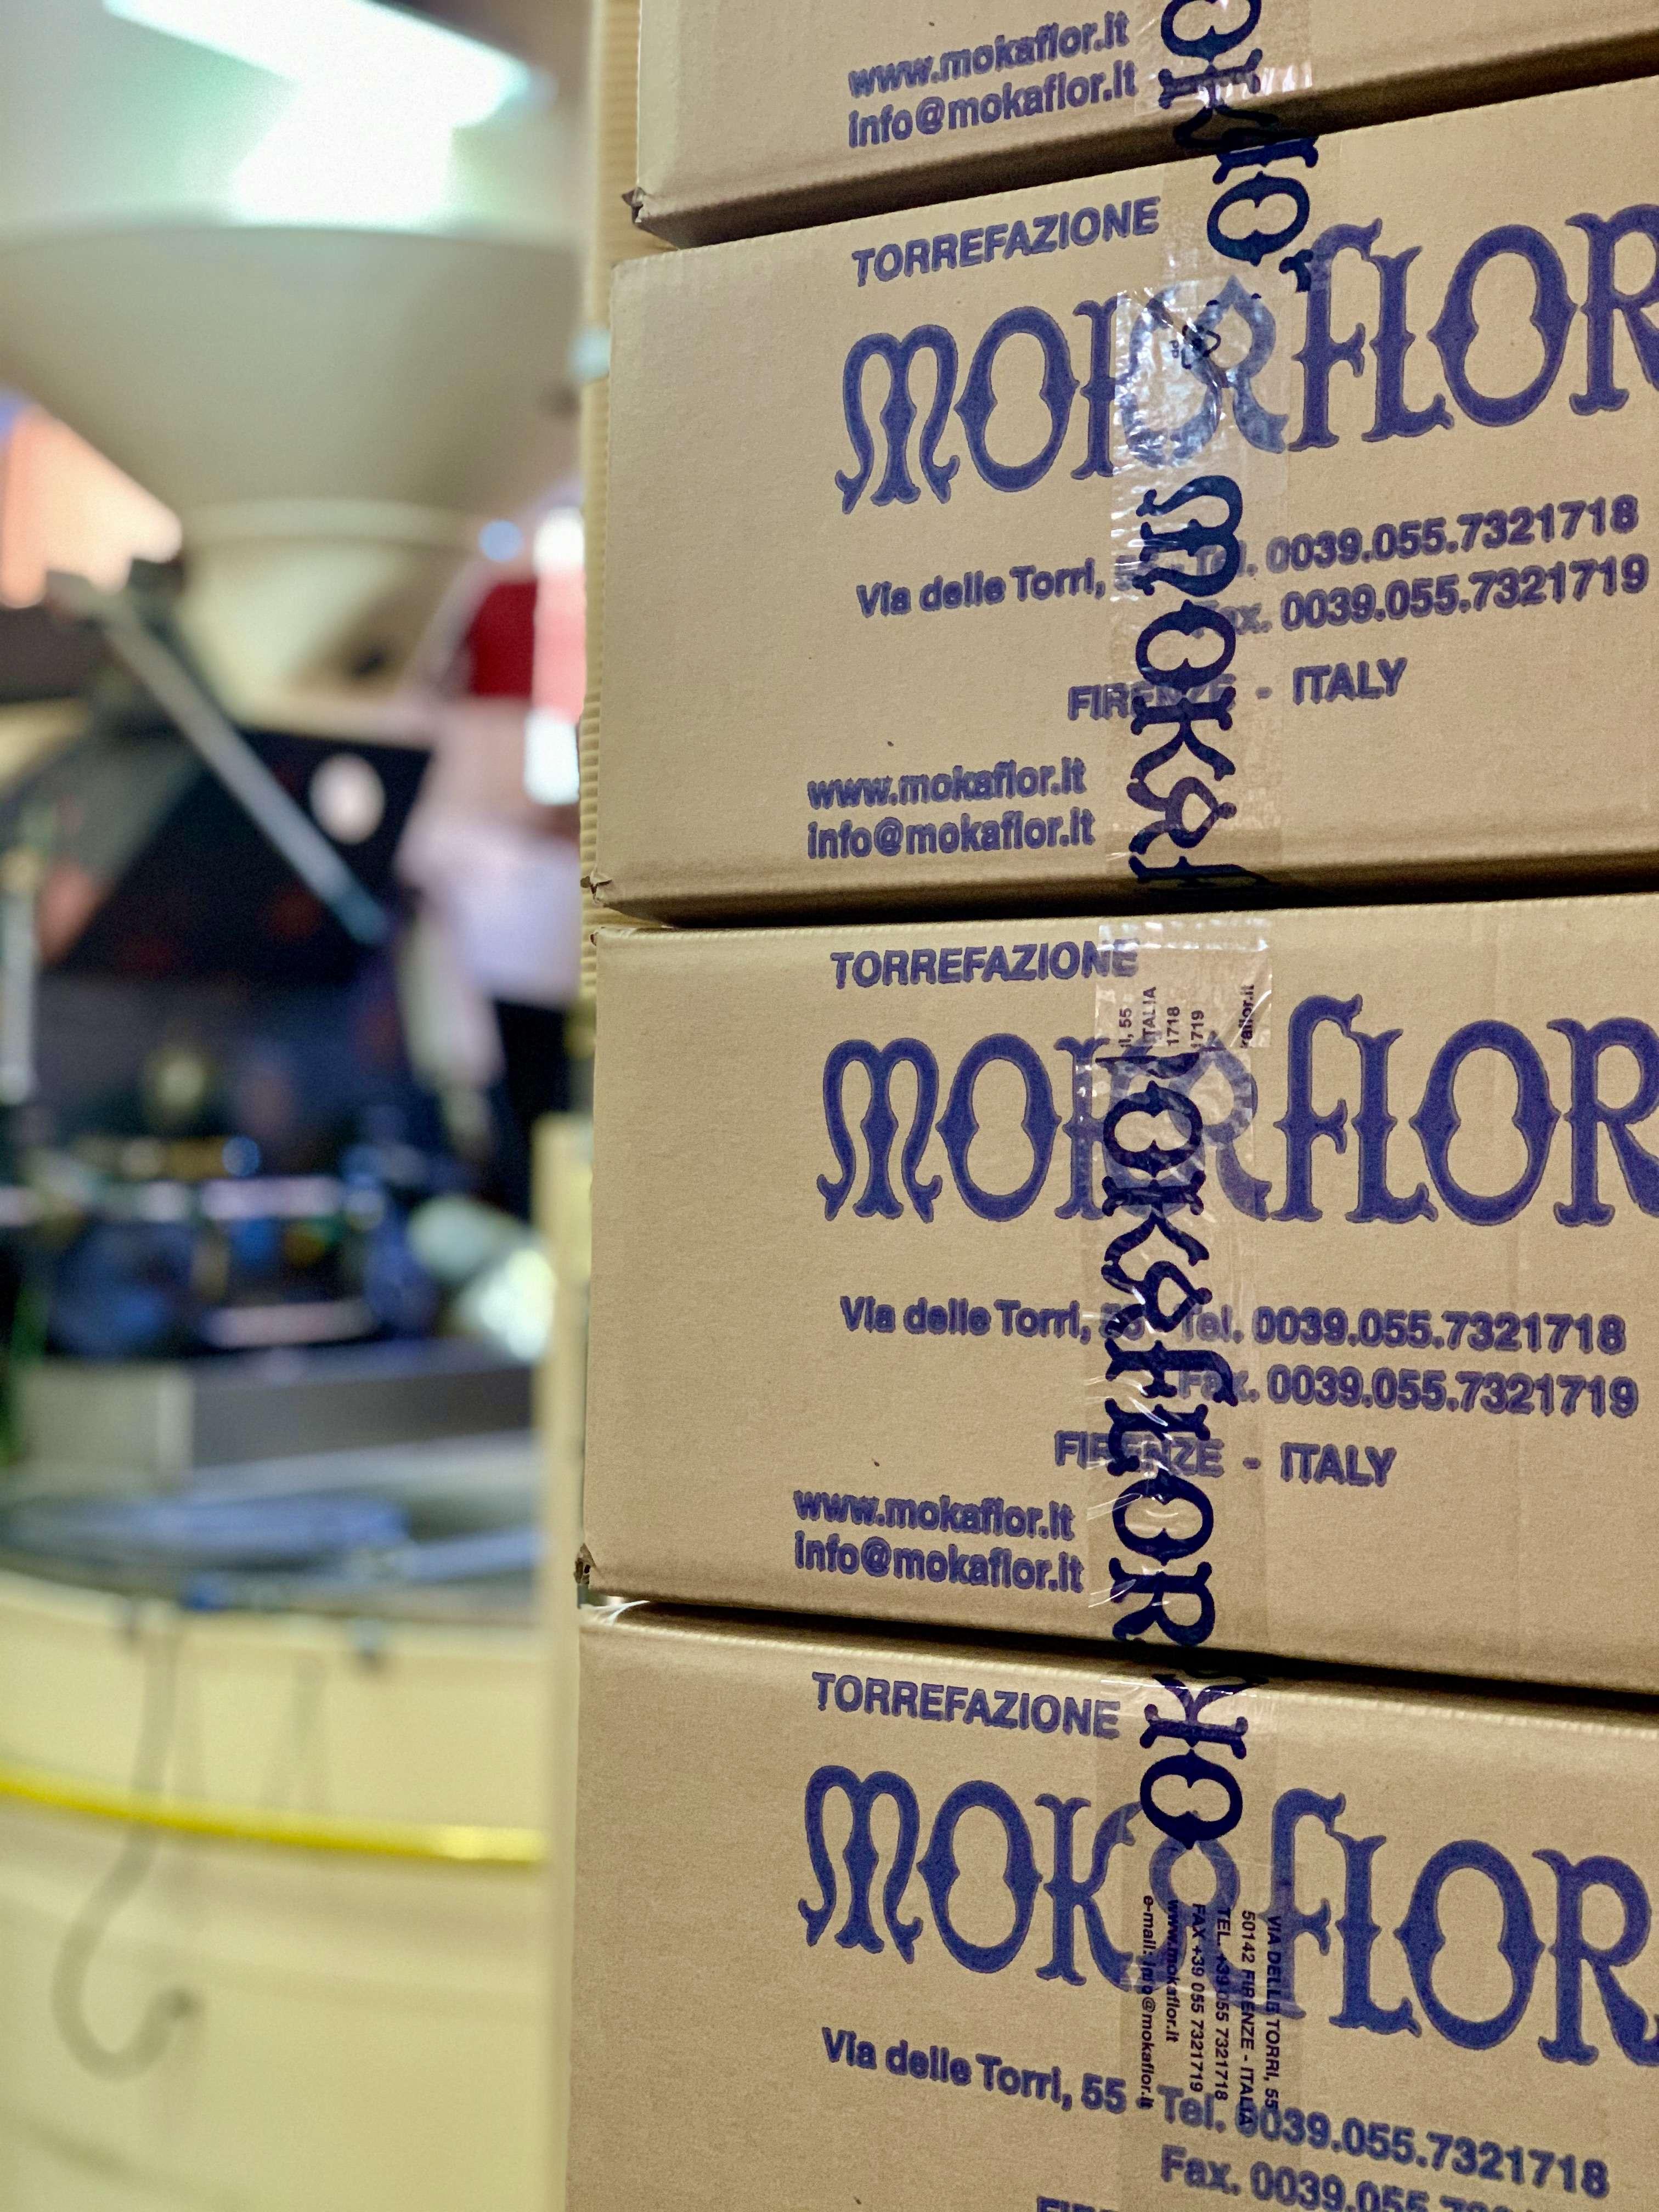 Mokaflor spendet Kaffee an die 'Gruppo Volontariato Vicenziano di Firenze'